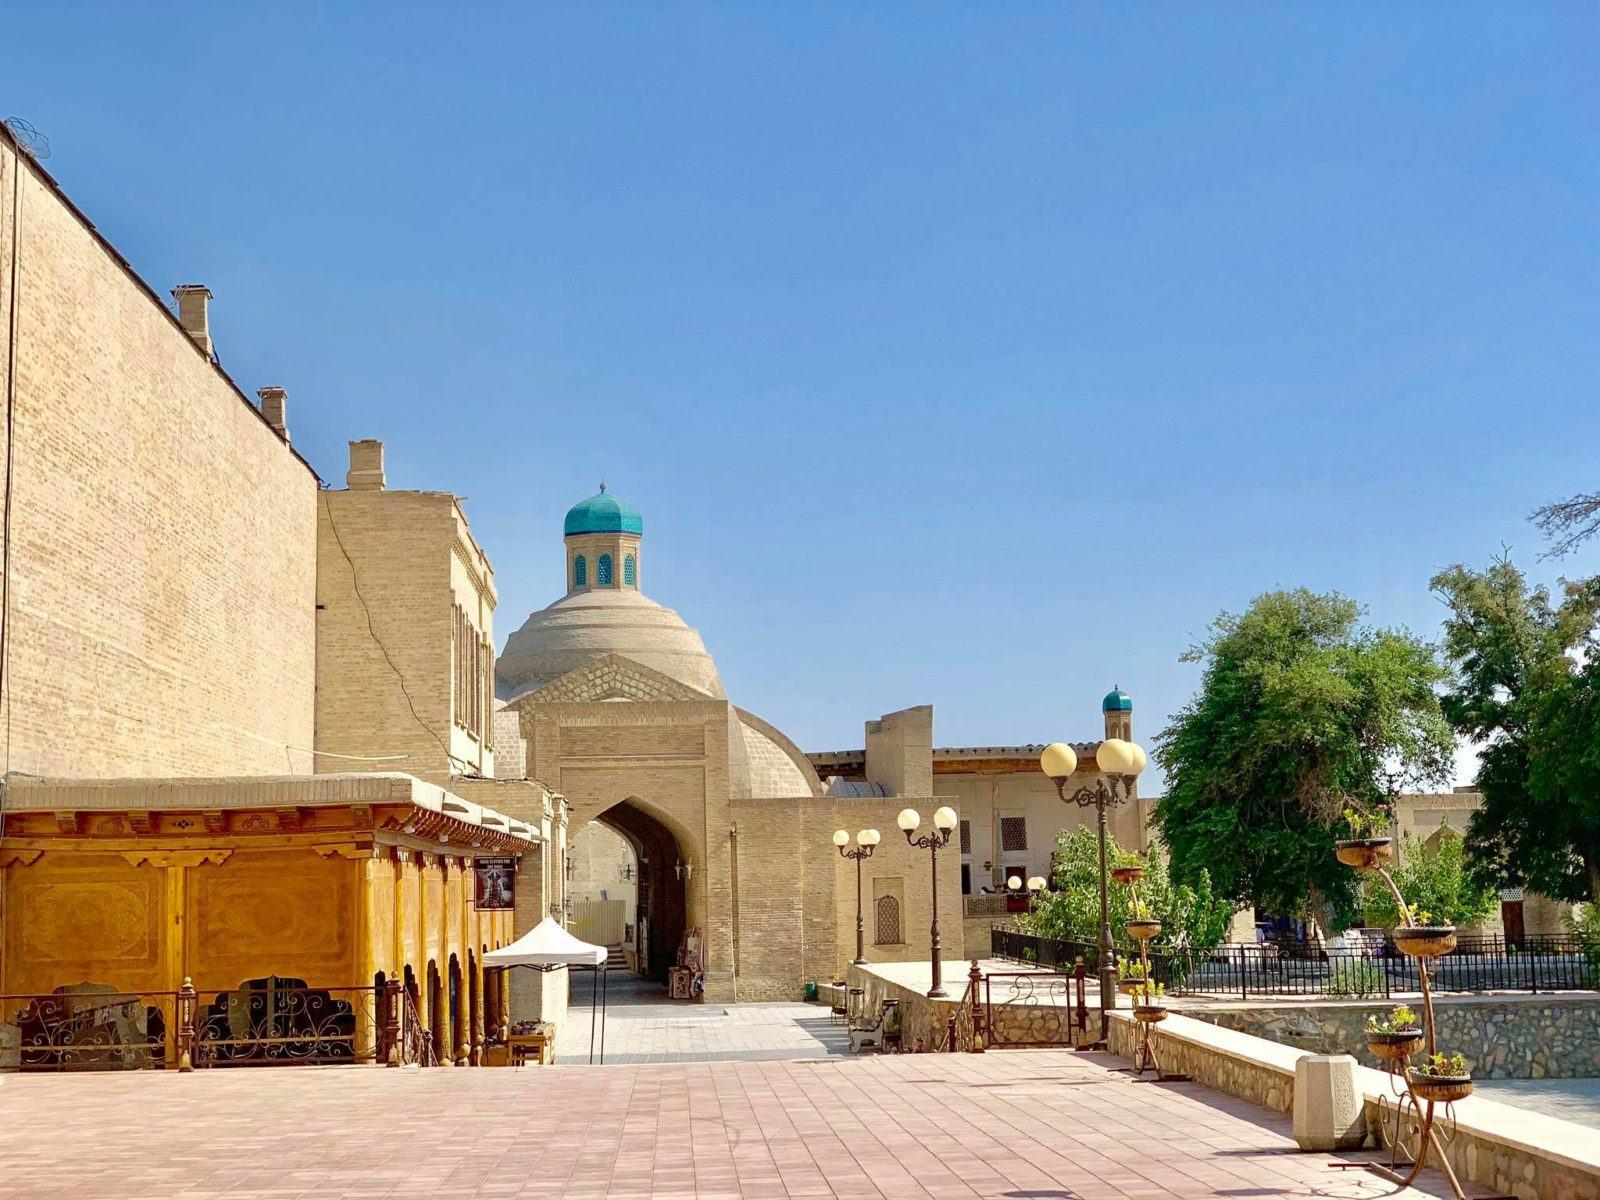 Train Ride and Overland Adventure in Uzbekistan5